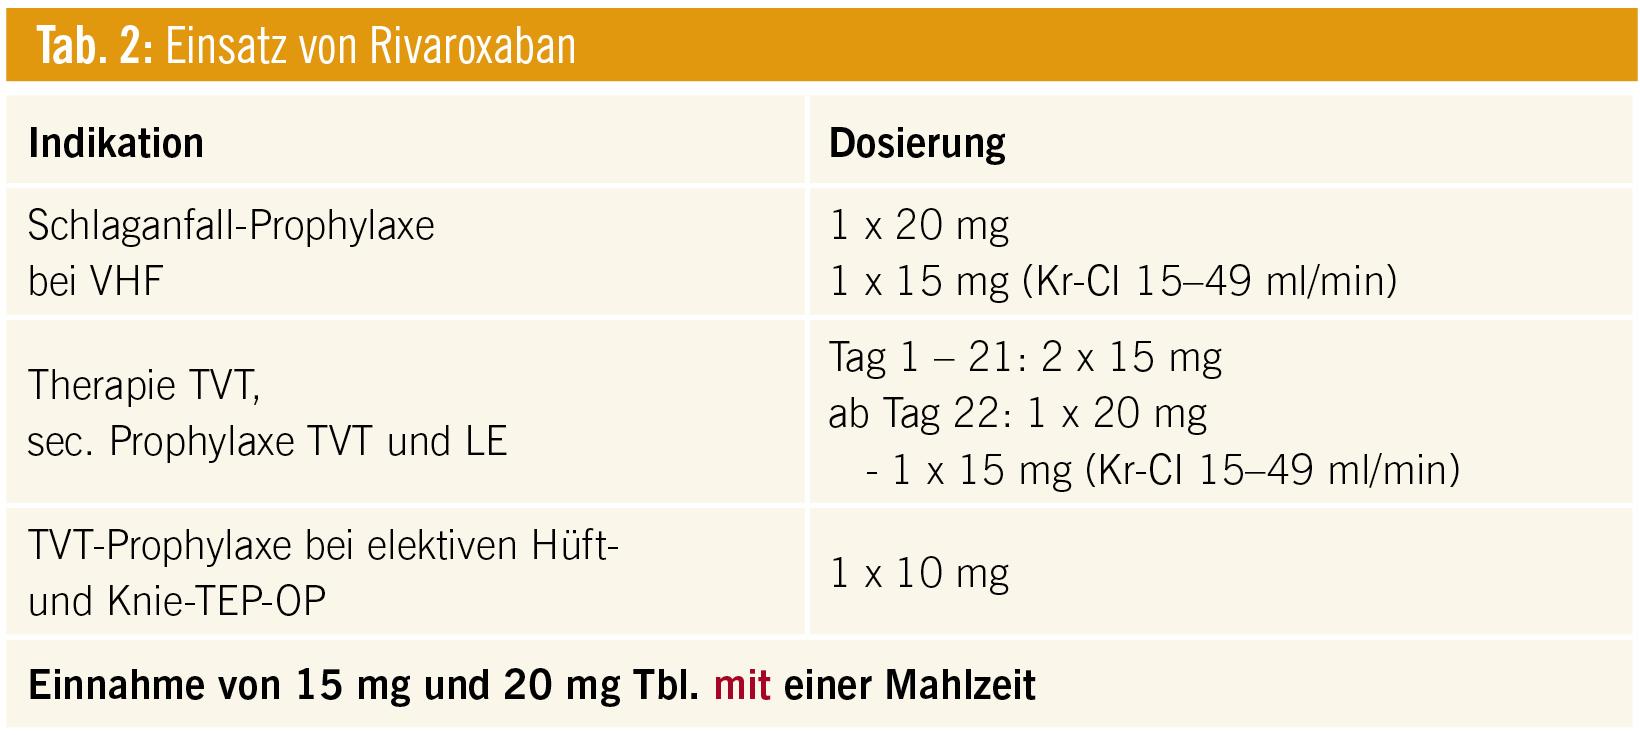 risiko langjährige einnahme pantoprazol